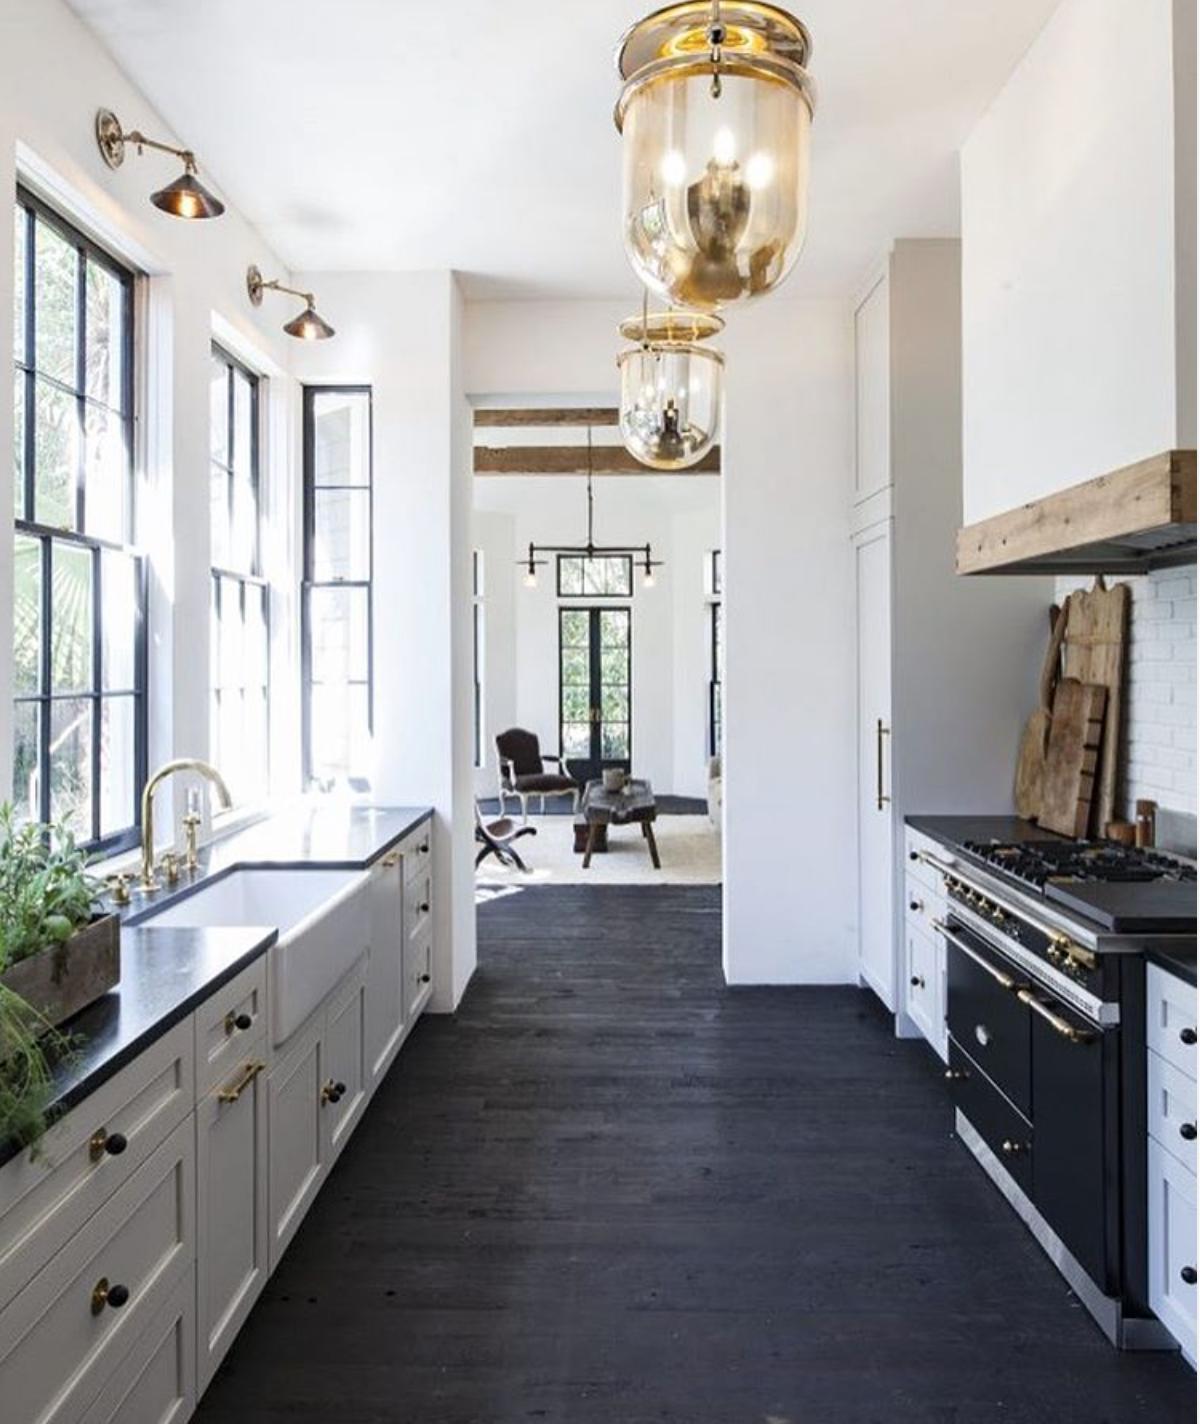 White Kitchen Cabinets With Dark Floors: Black Countertops With Dark Floors. Love!